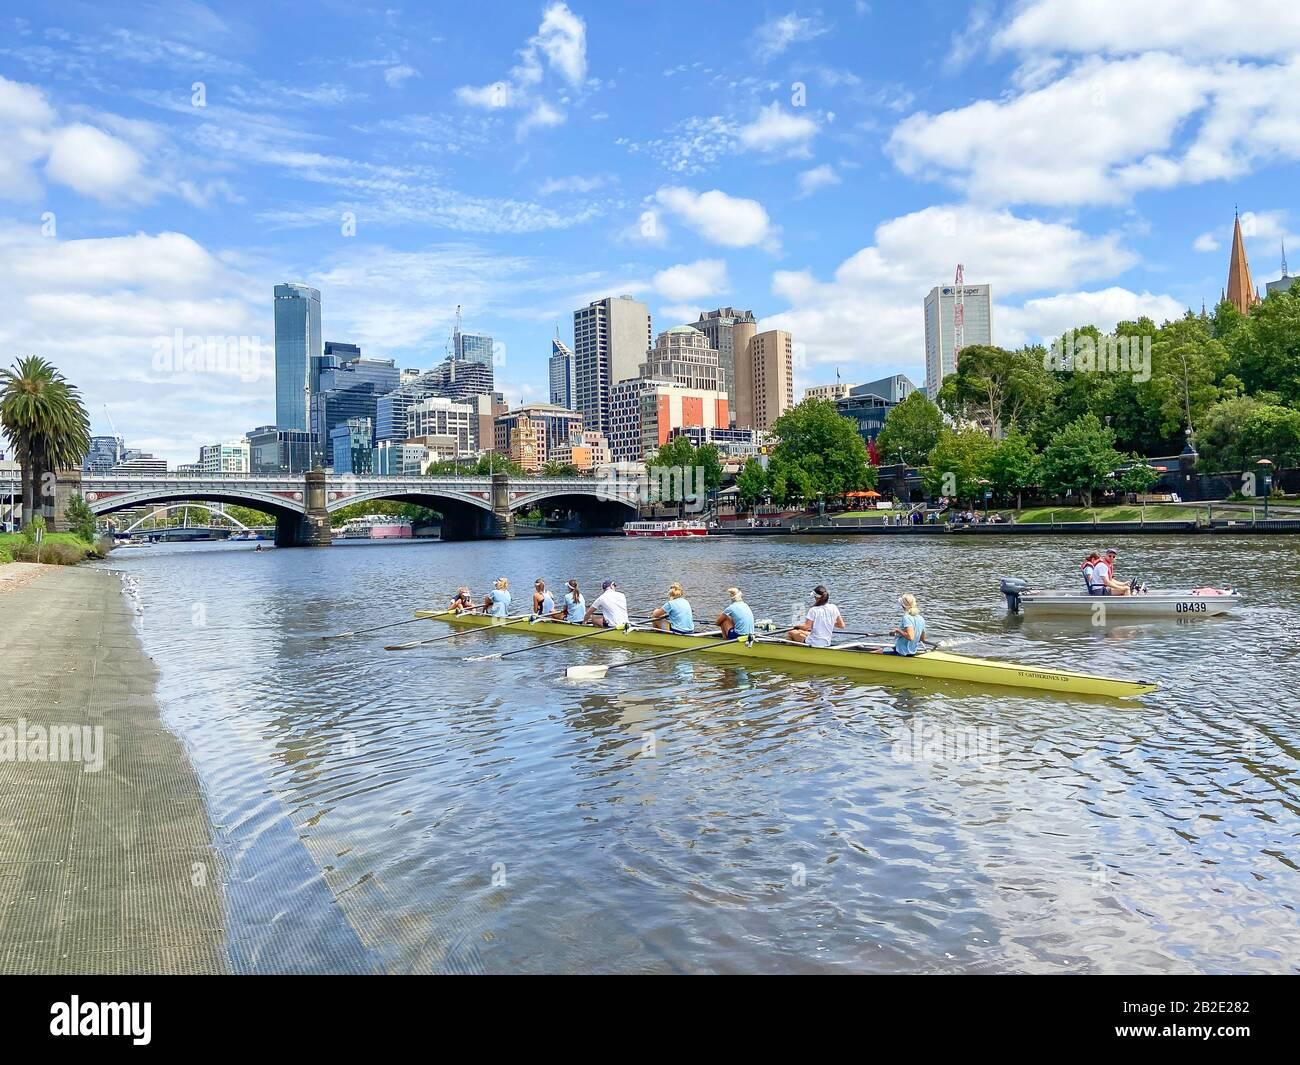 City view across Yarra River from Alexandra Gardens, Melbourne, Victoria, Australia Stock Photo